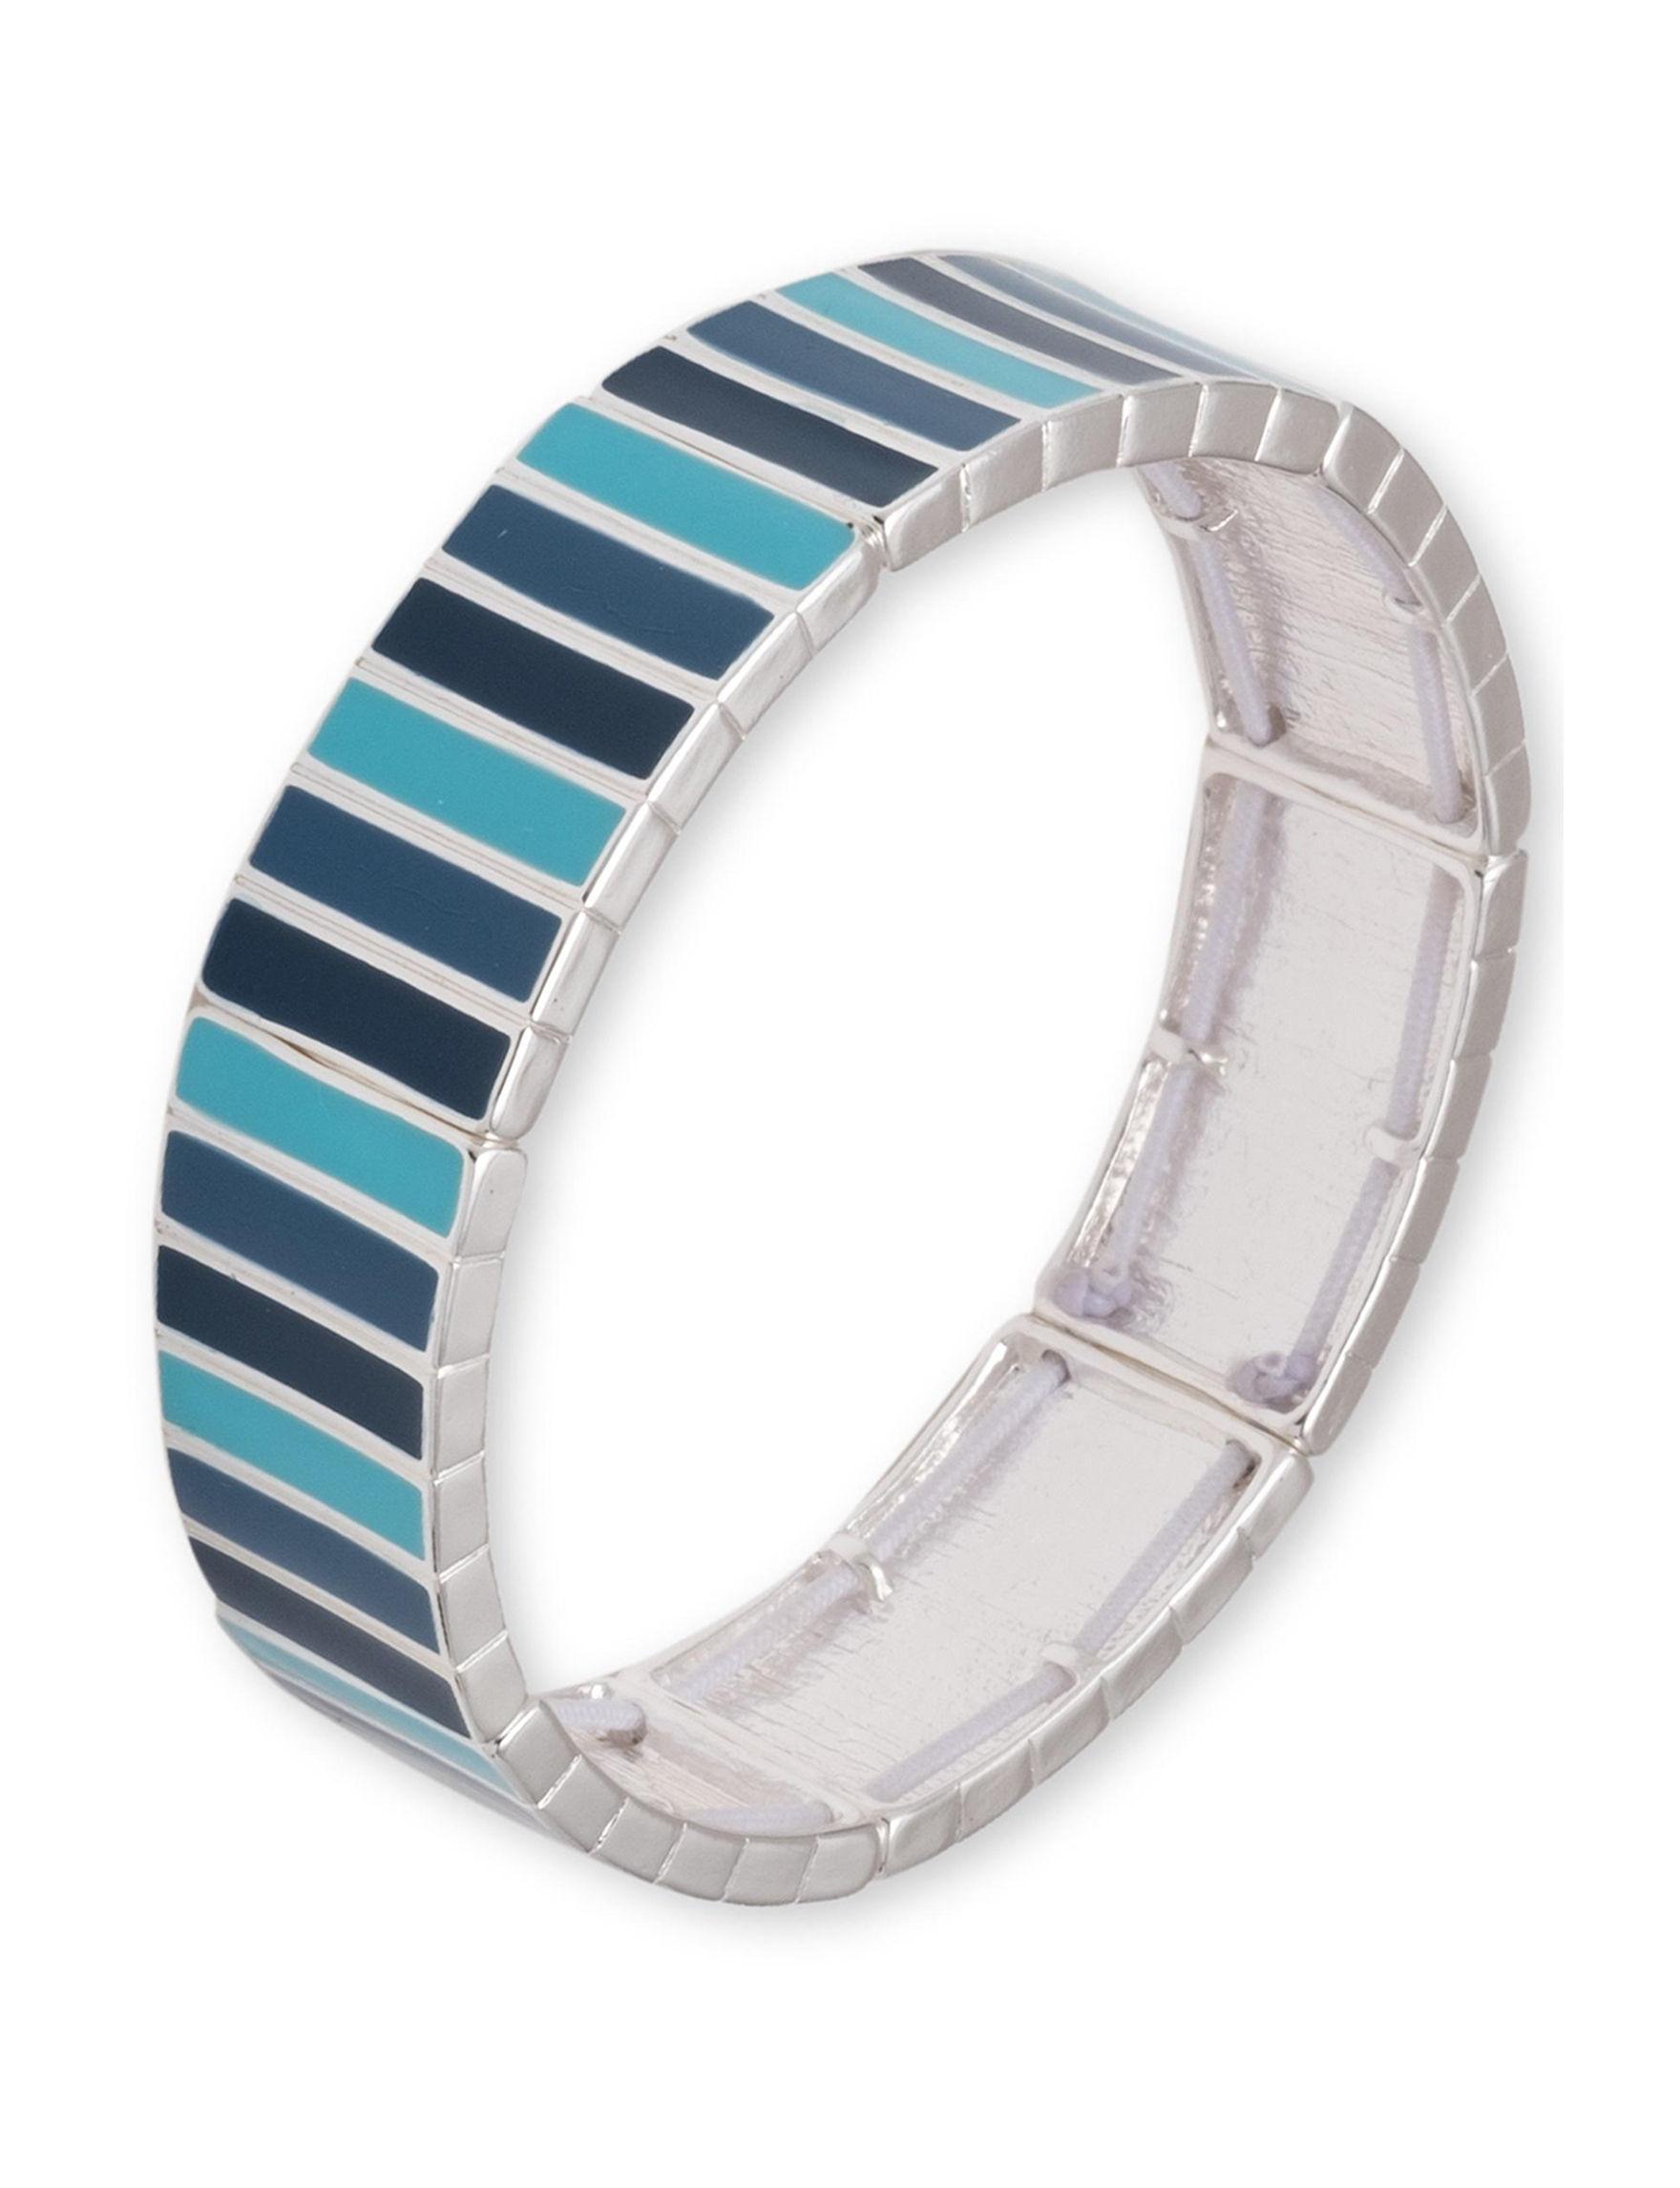 Chaps Blue / Silver Bracelets Fashion Jewelry